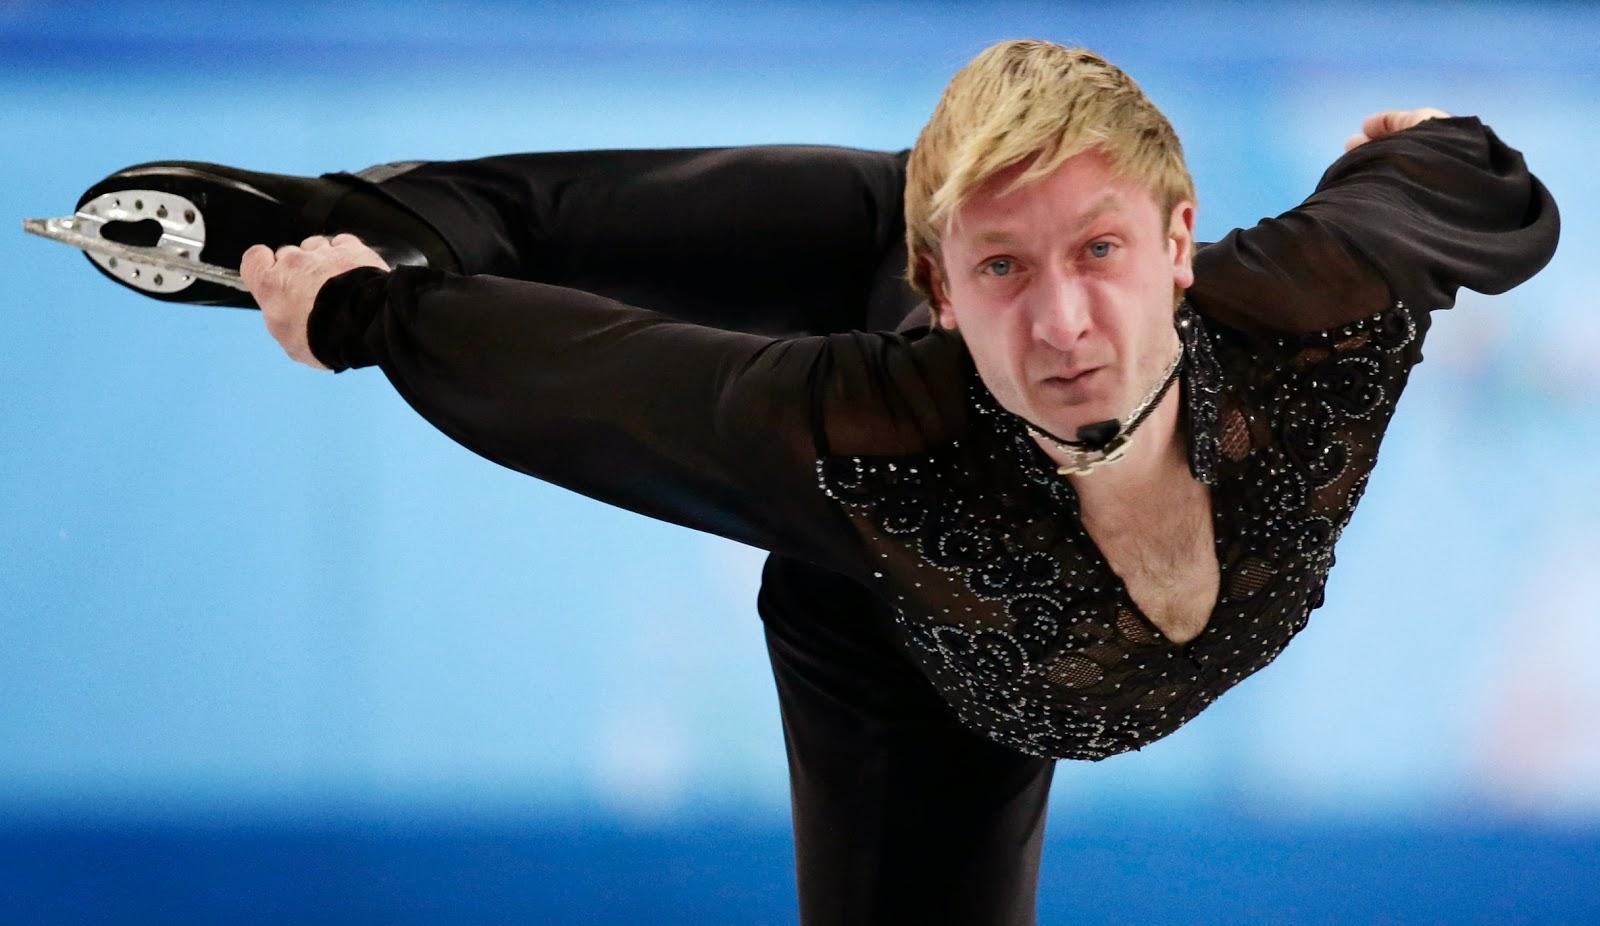 Evgeni Plushenko,olympic skater,winter olympics